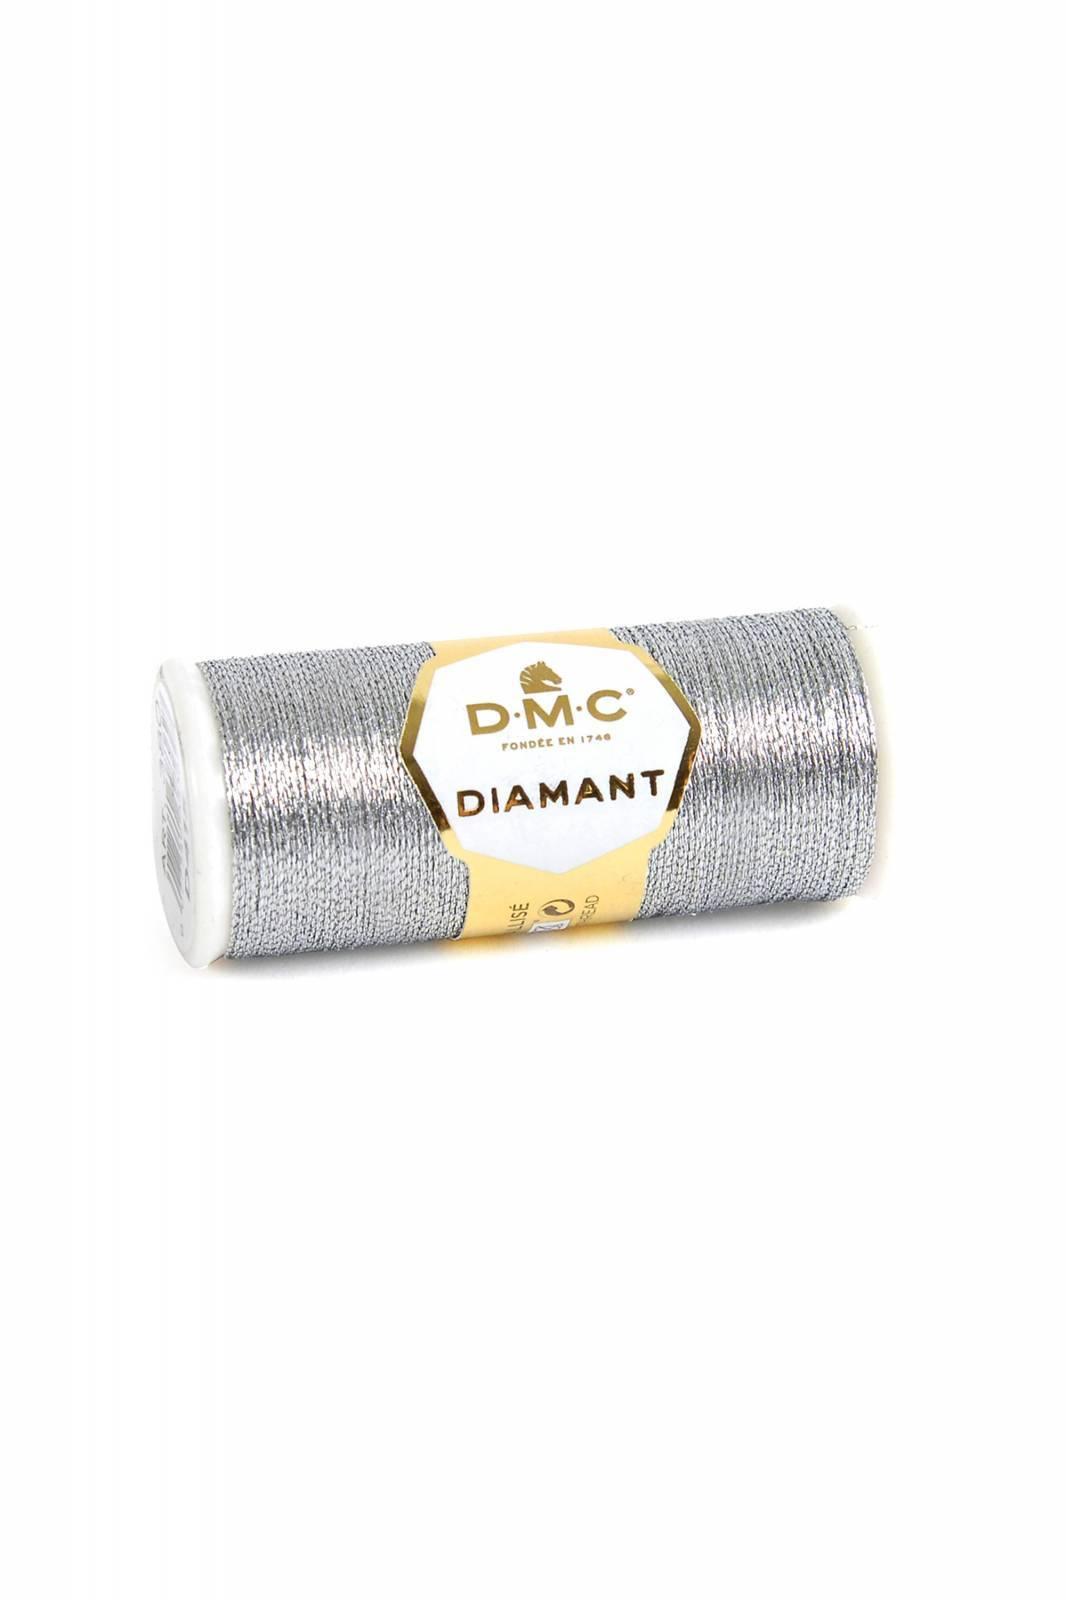 DMC Diamant cor 415 - BAÚ DA VOVÓ